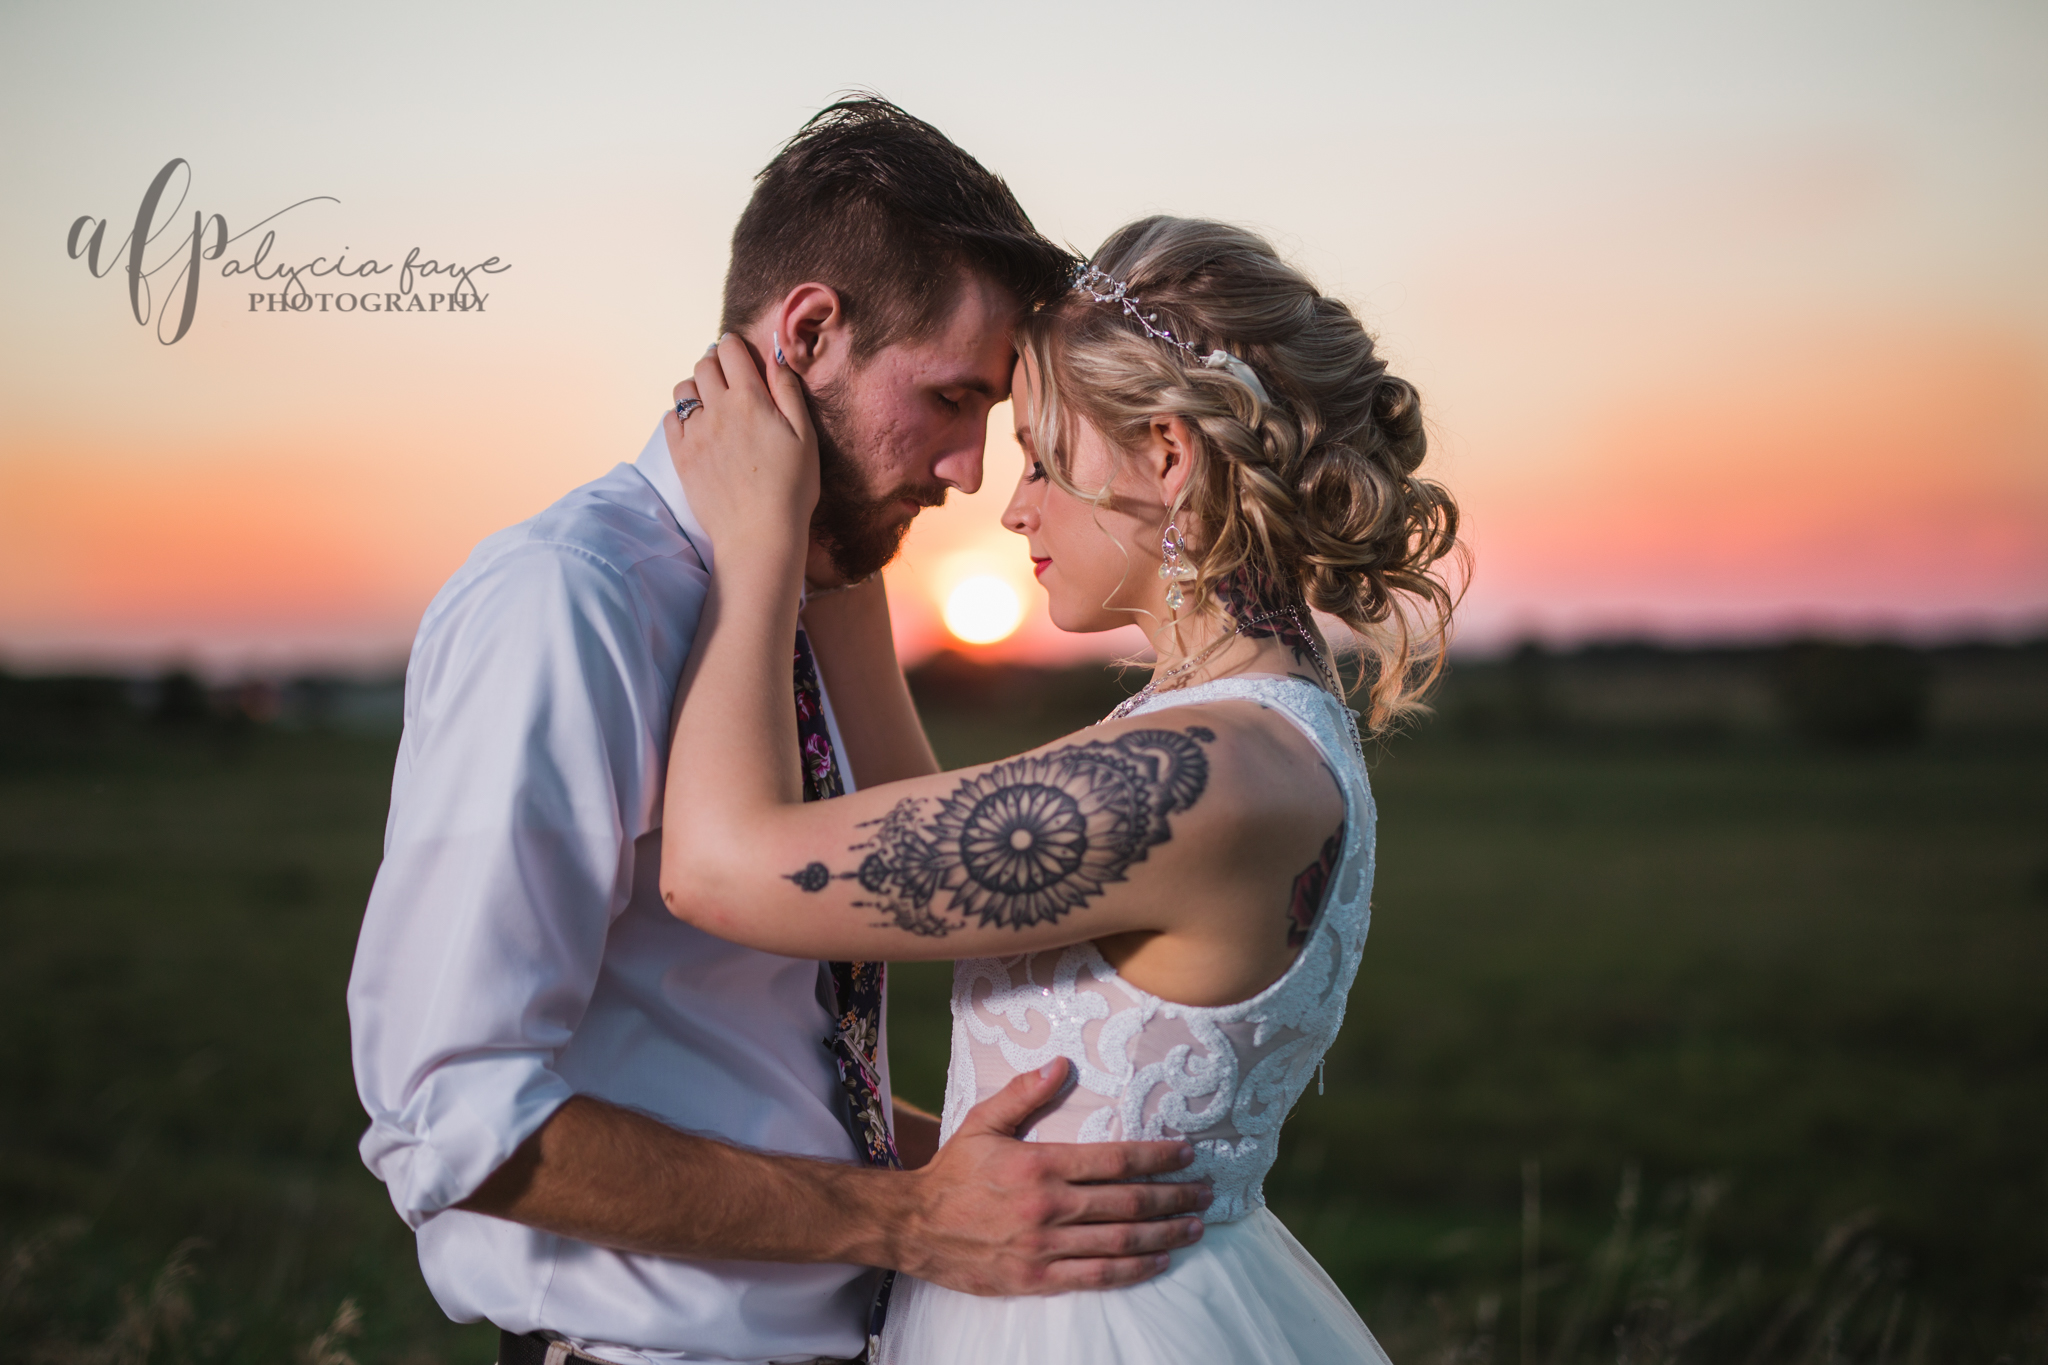 christian-wedding-photograper-minneapolis-minnesota-alycia-faye-photographer-9109.jpg